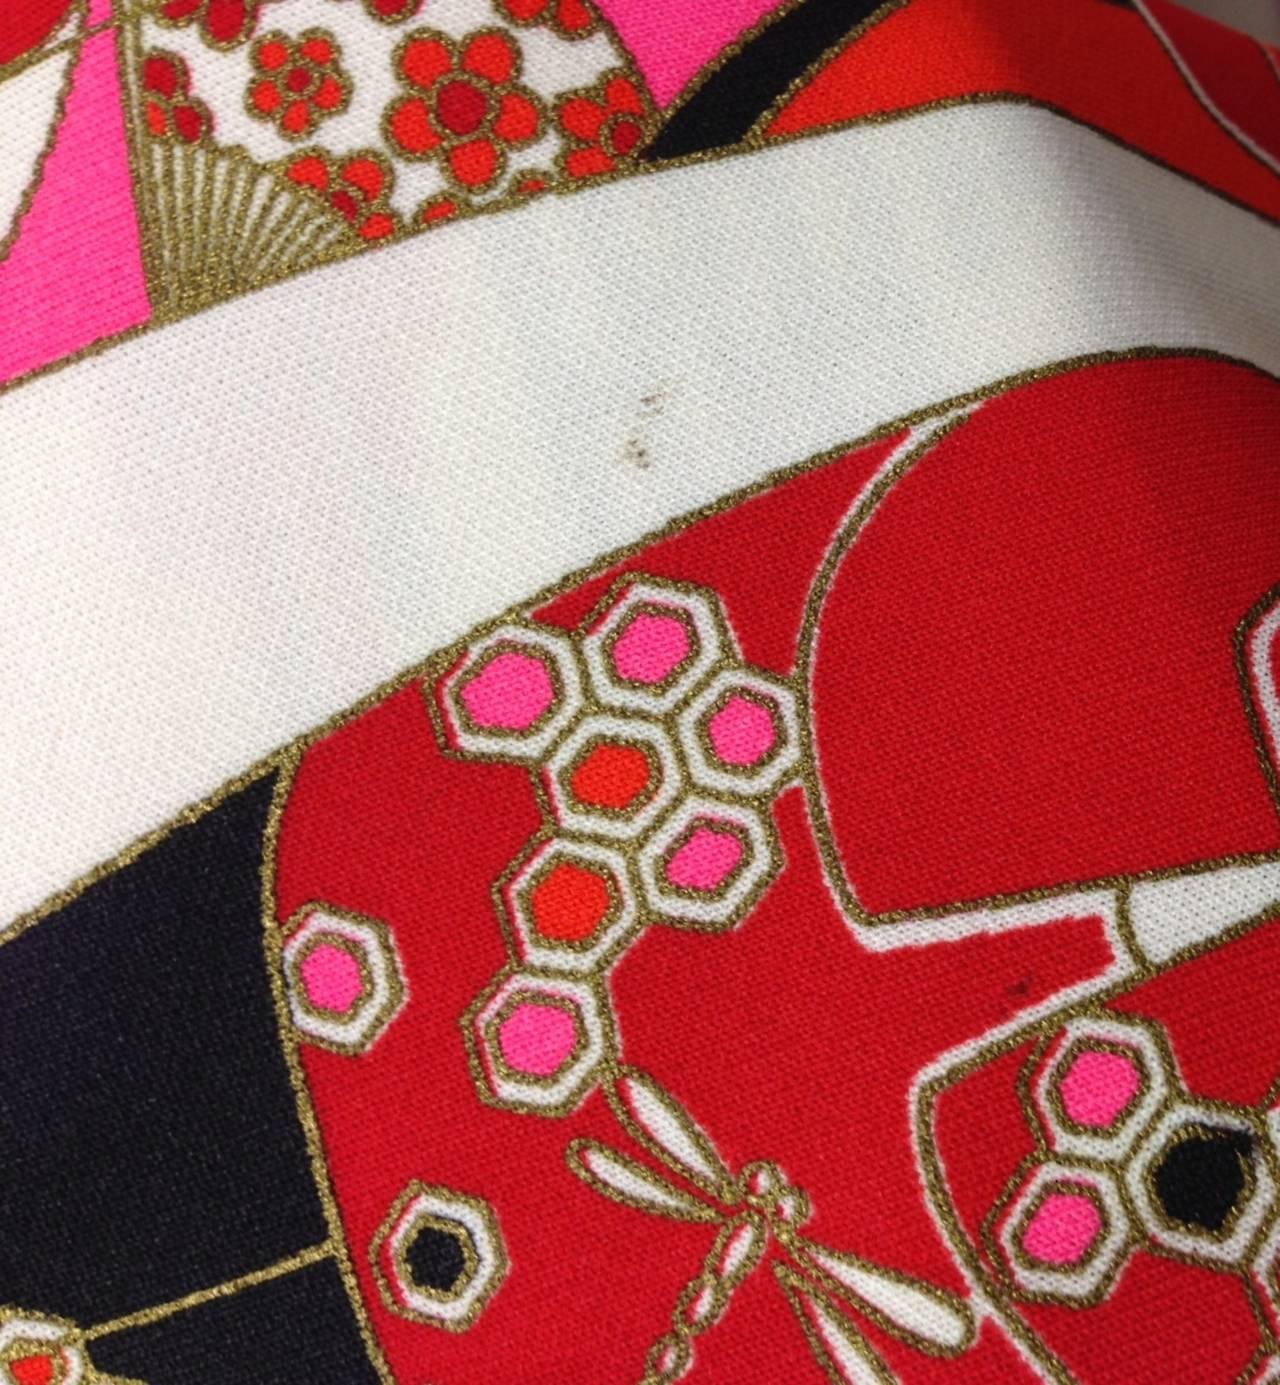 1960s Shaheen Kokeshi Doll Border Print Maxi Skirt with Obi Belt 3